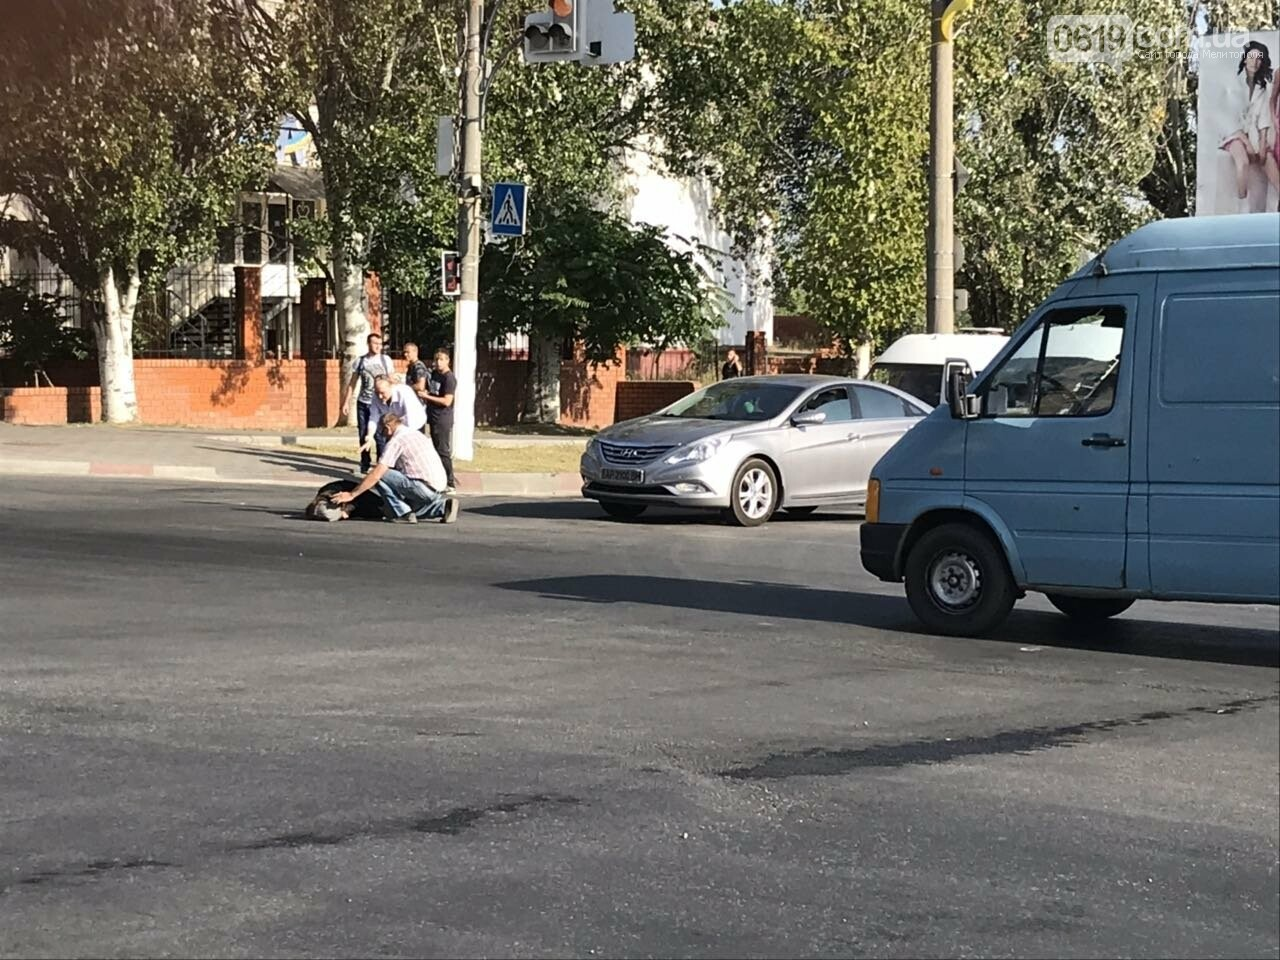 В Мелитополе на пешеходном переходе сбили девушку, - ФОТО, фото-5, Фото сайта 0619